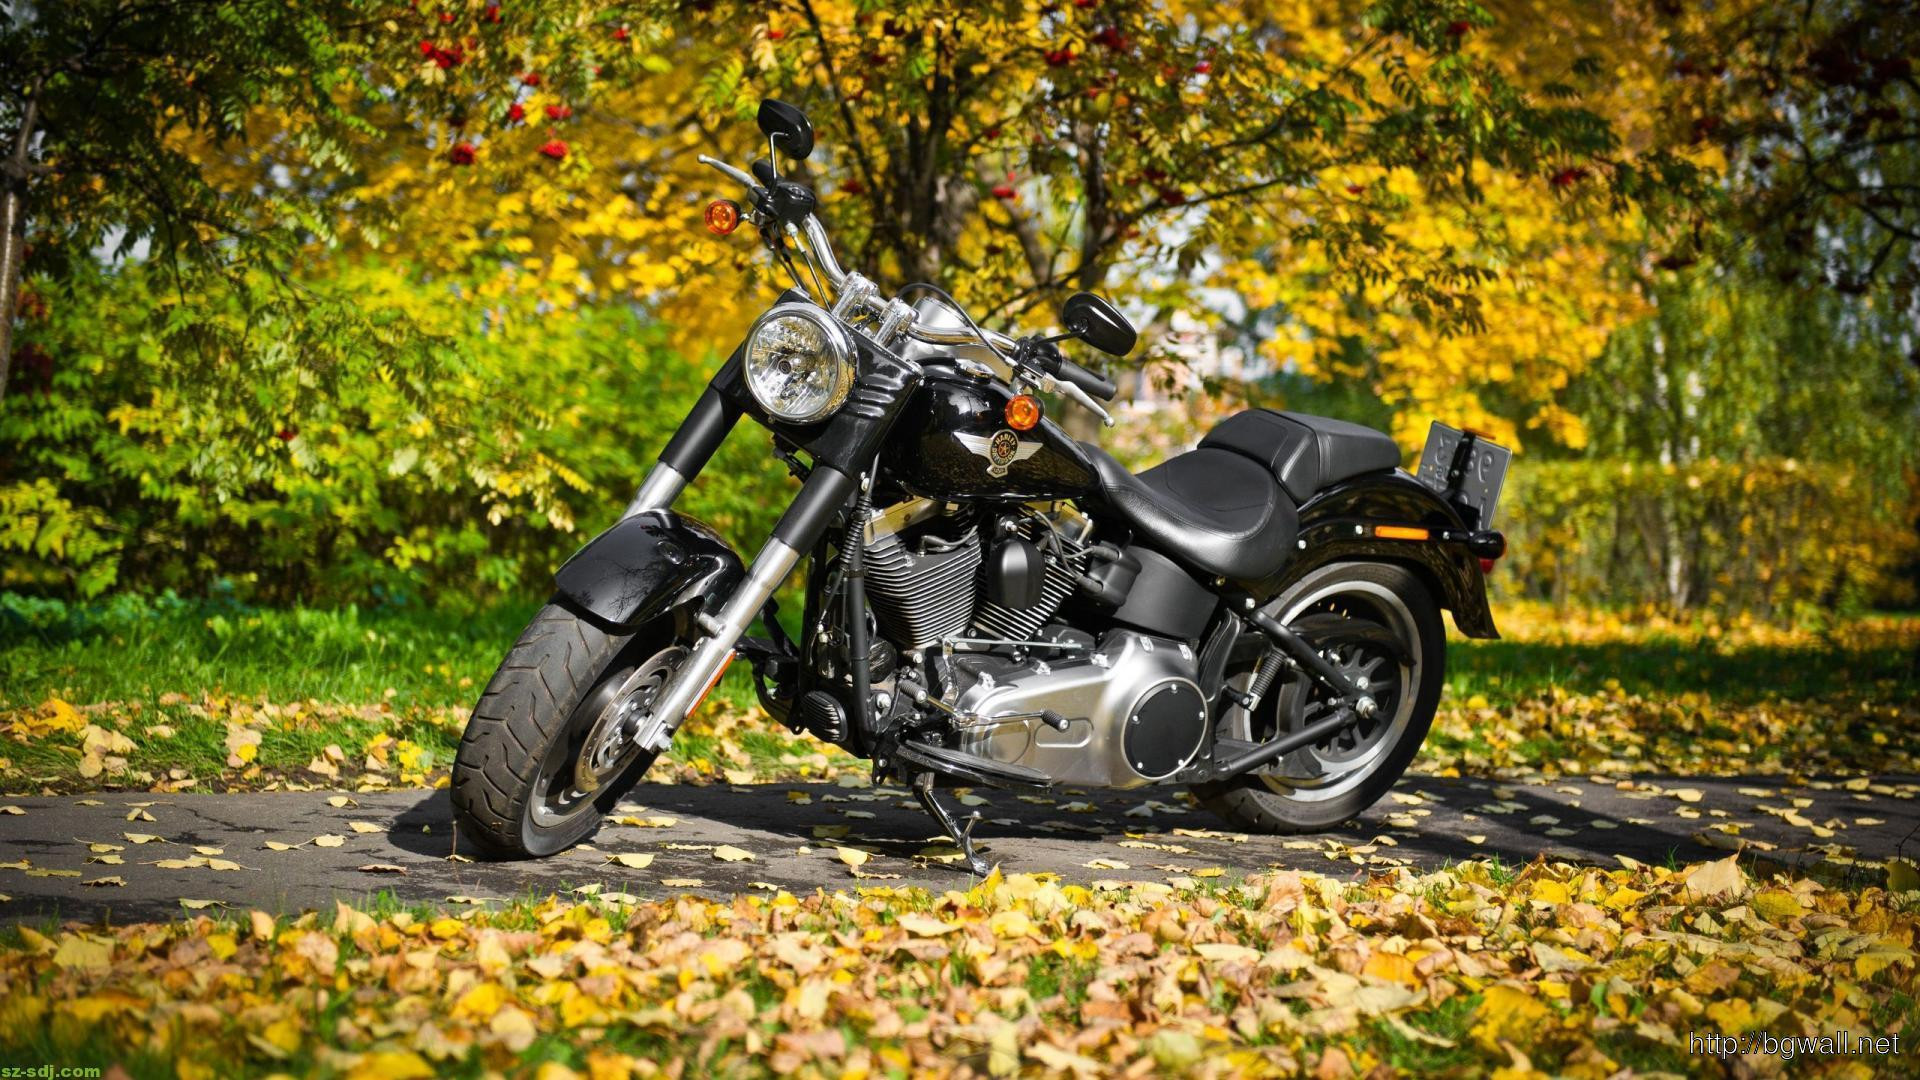 Harley Davidson Image Wallpaper – Background HD